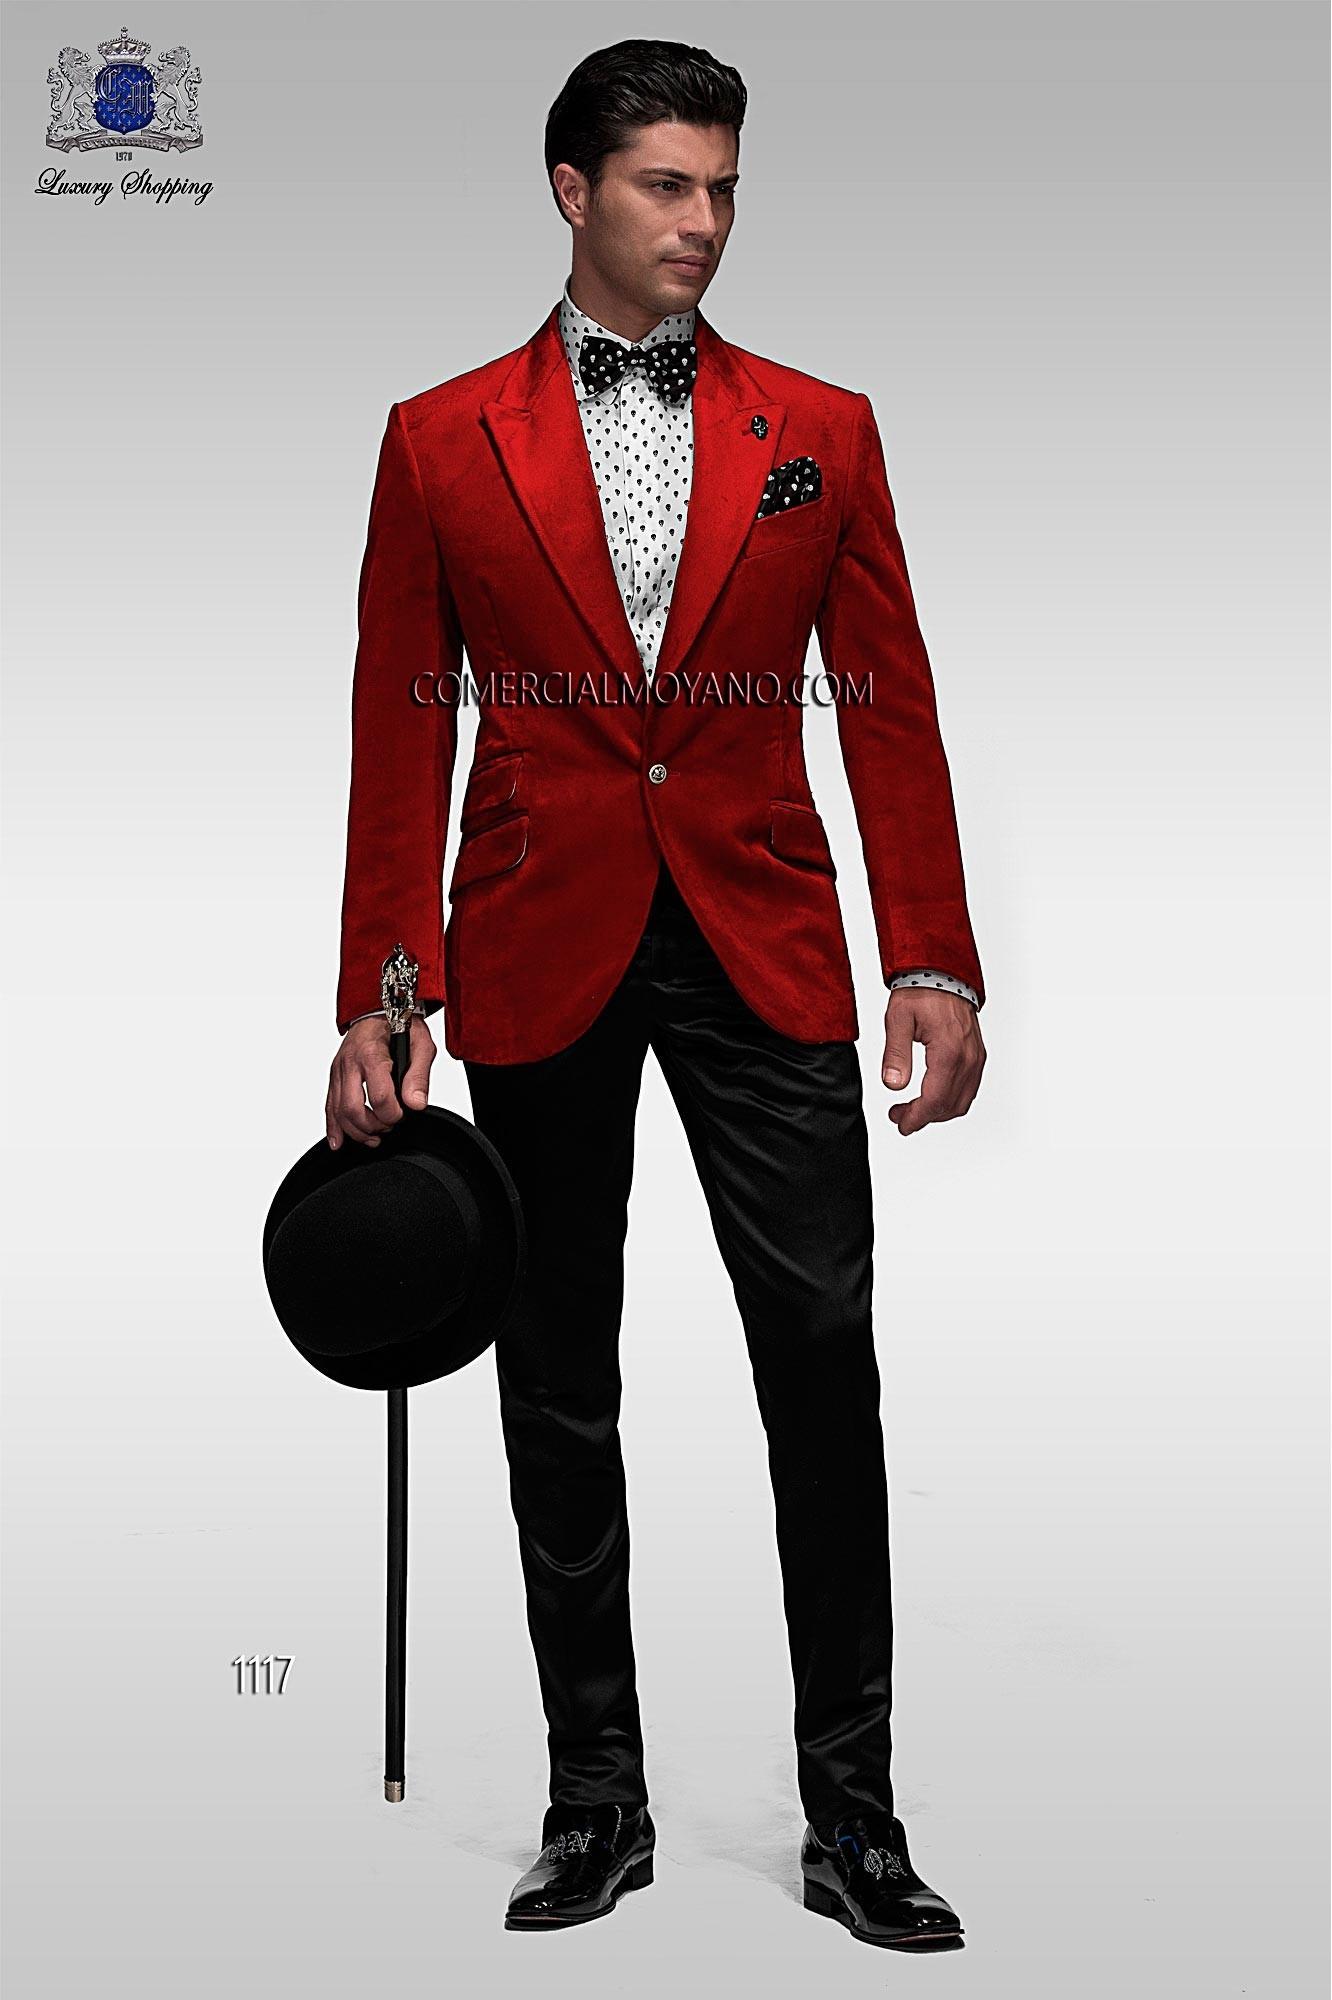 Emotion red men wedding suit model 1117 Ottavio Nuccio Gala